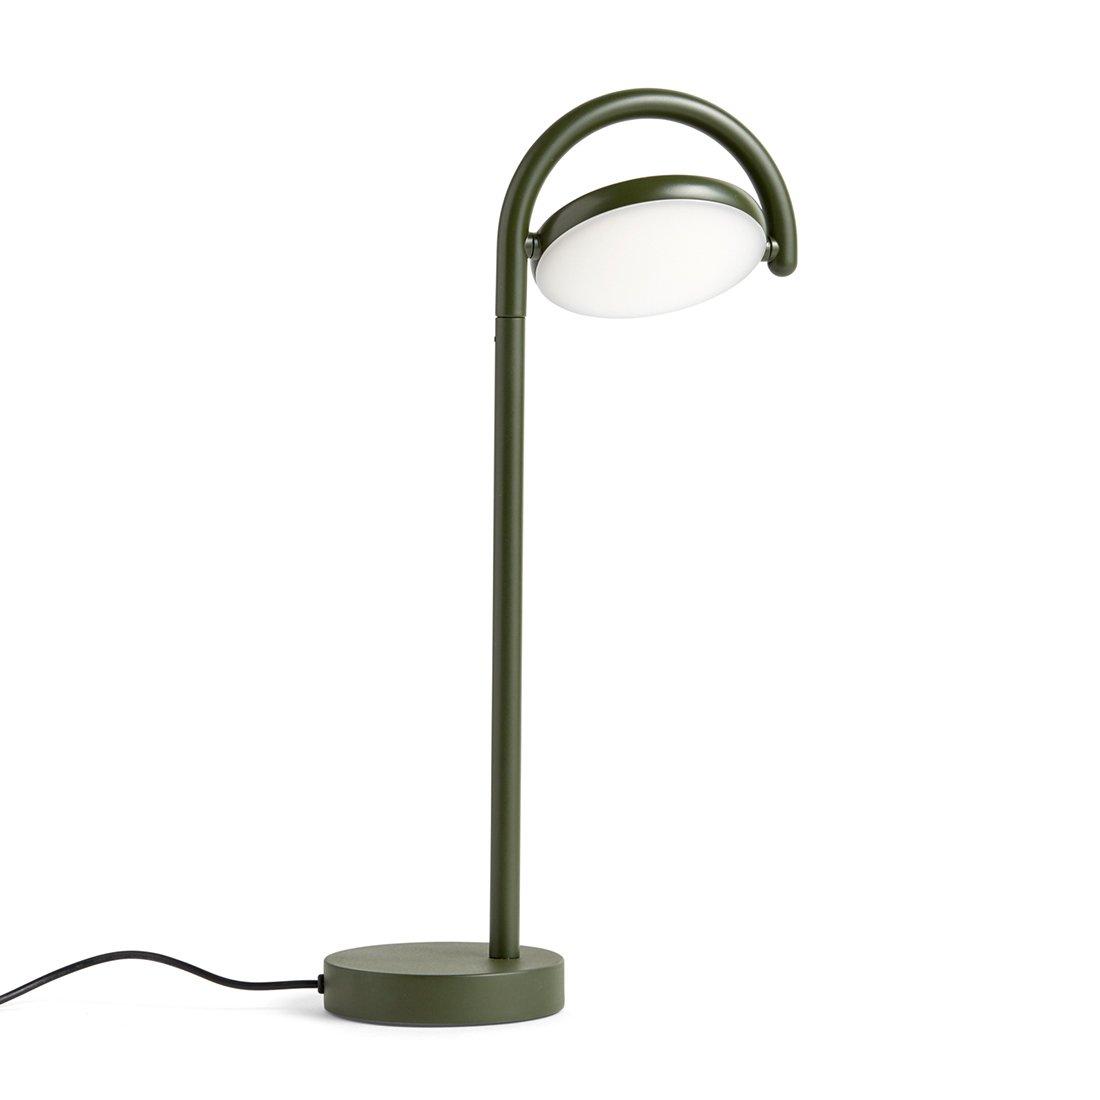 HAY Marselis Tafellamp - Kaki Groen